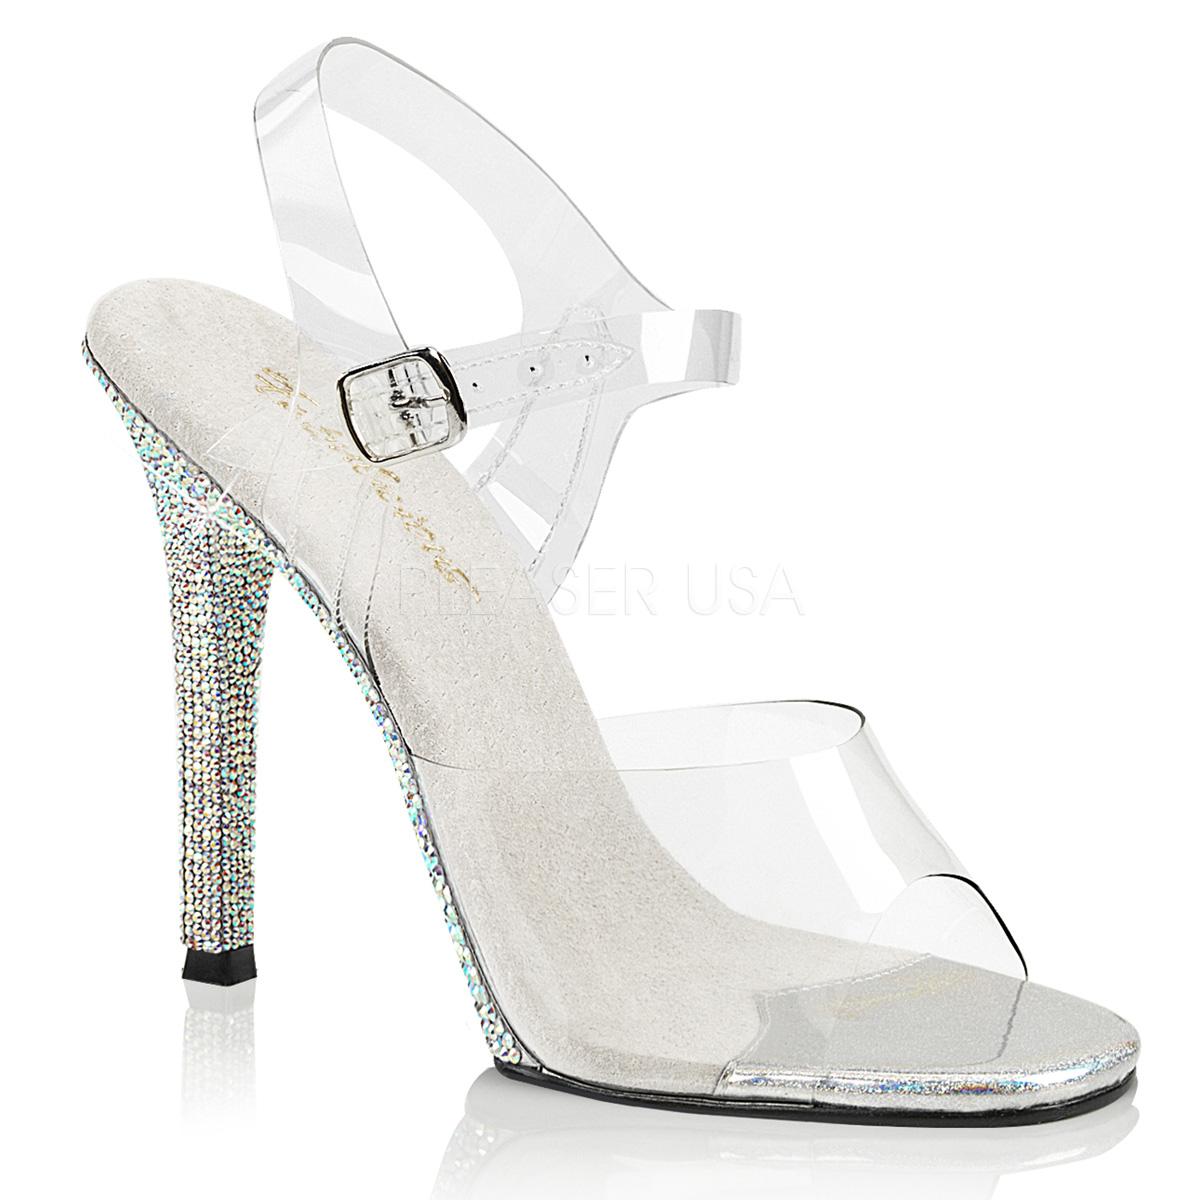 Sandales transparentes talon strass - Pointure : 36